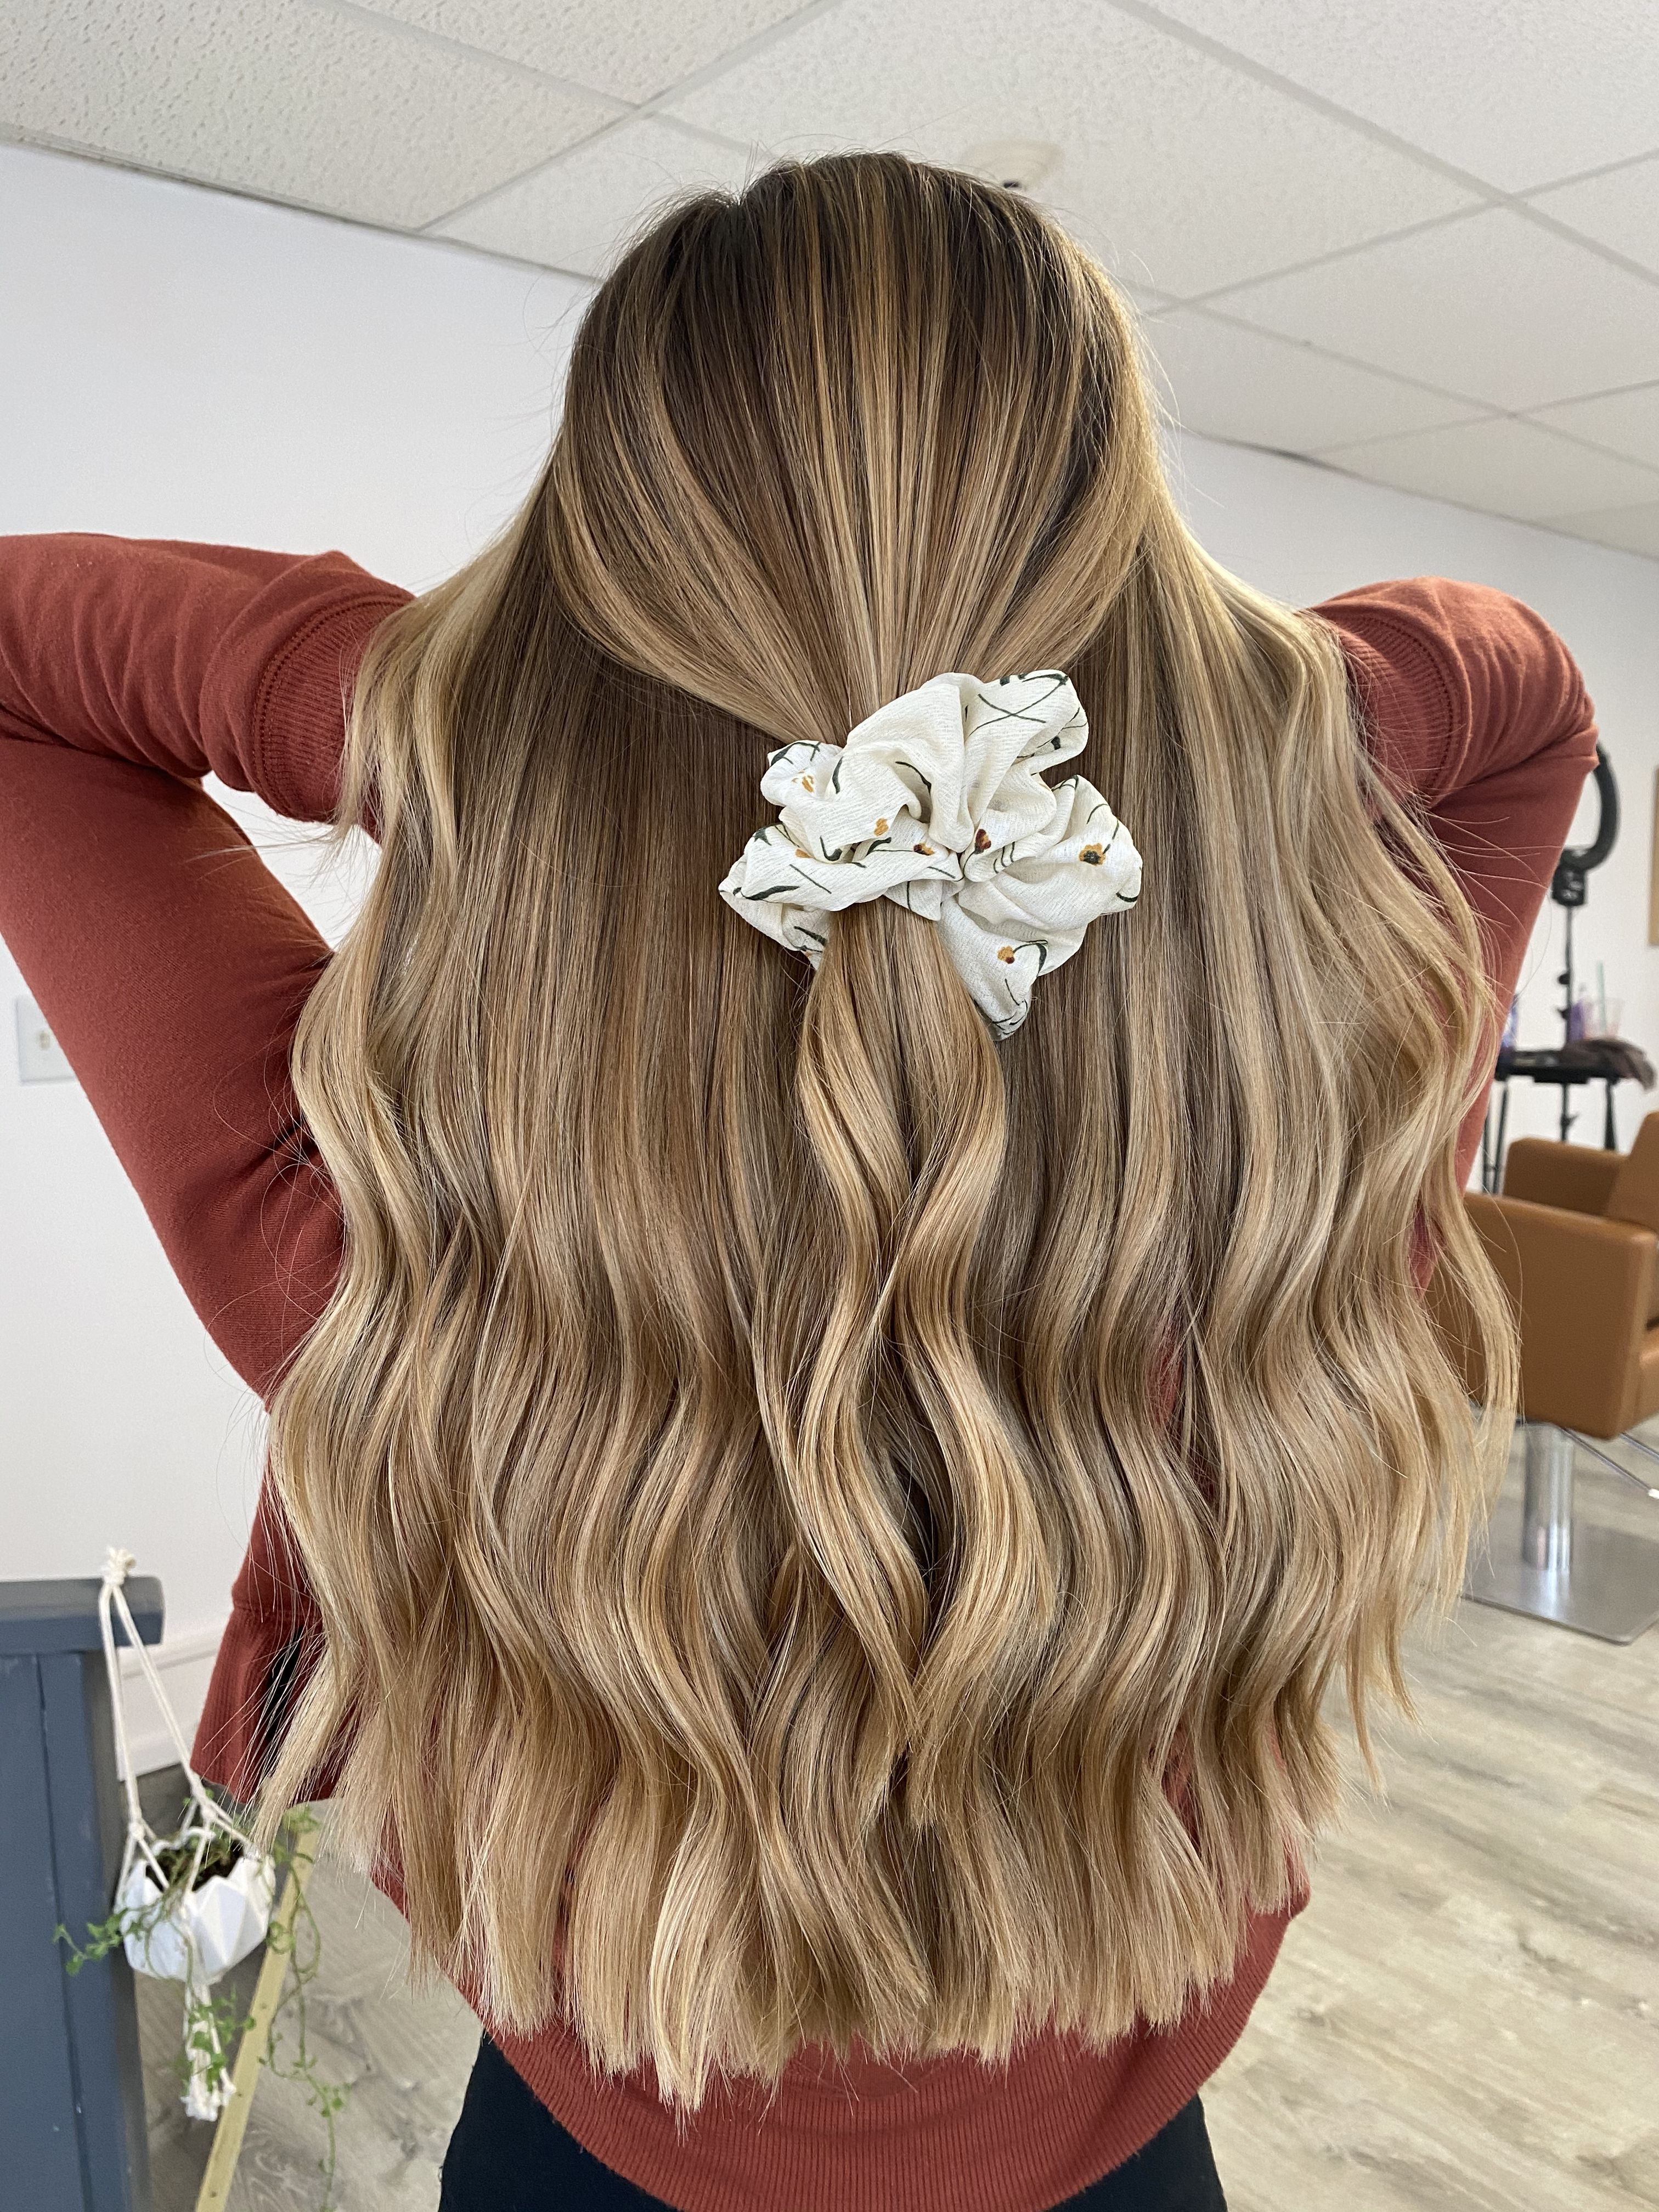 Butterscotch Blonde In 2020 Hair Styles Aesthetic Hair Blonde Hair Looks